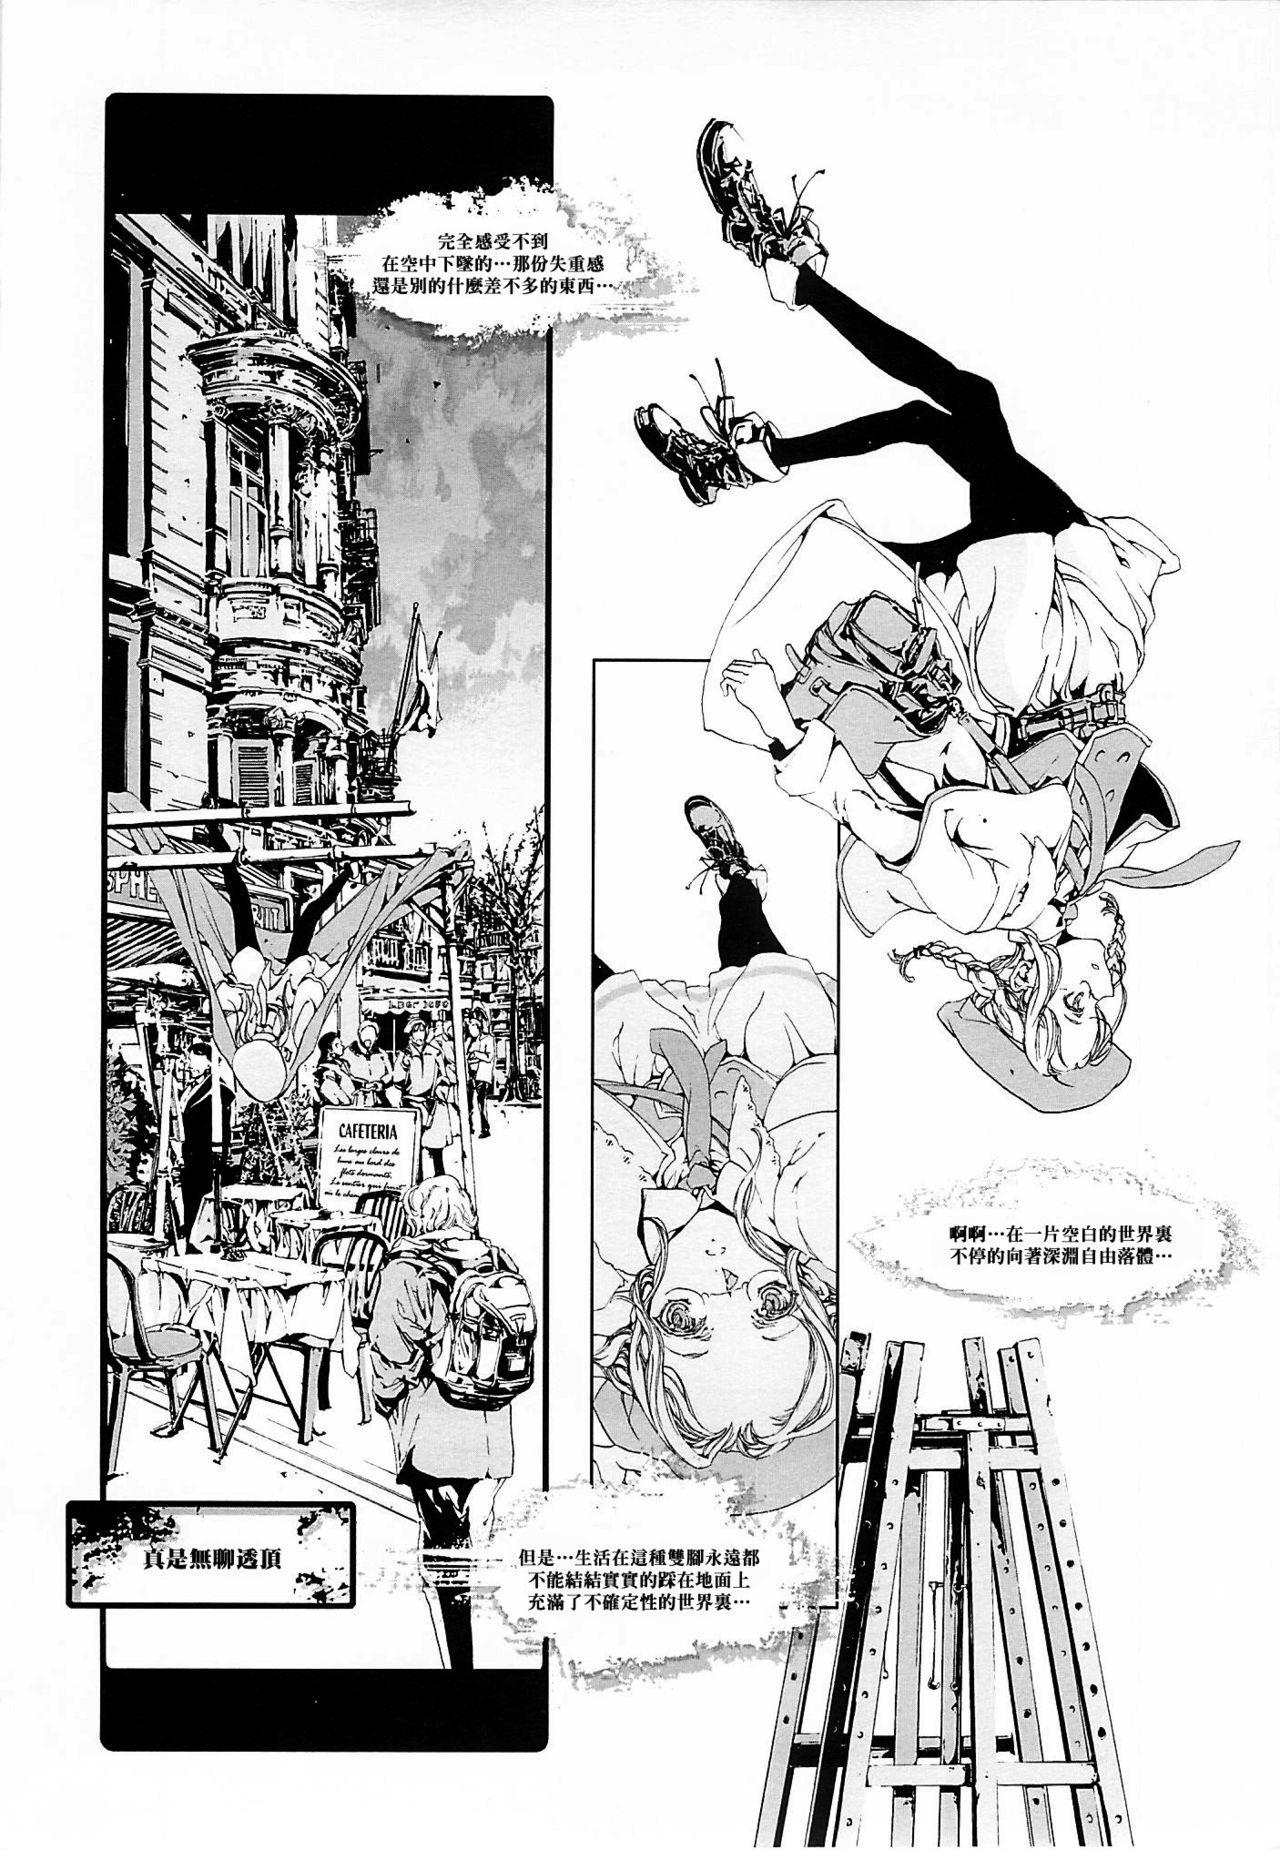 (CR37) [70 Nenshiki Yuukyuu Kikan (Endou Okito)] ORGAN-Tino  01-02[Chinese] [拾荒者汉化组] [Incomplete] 24